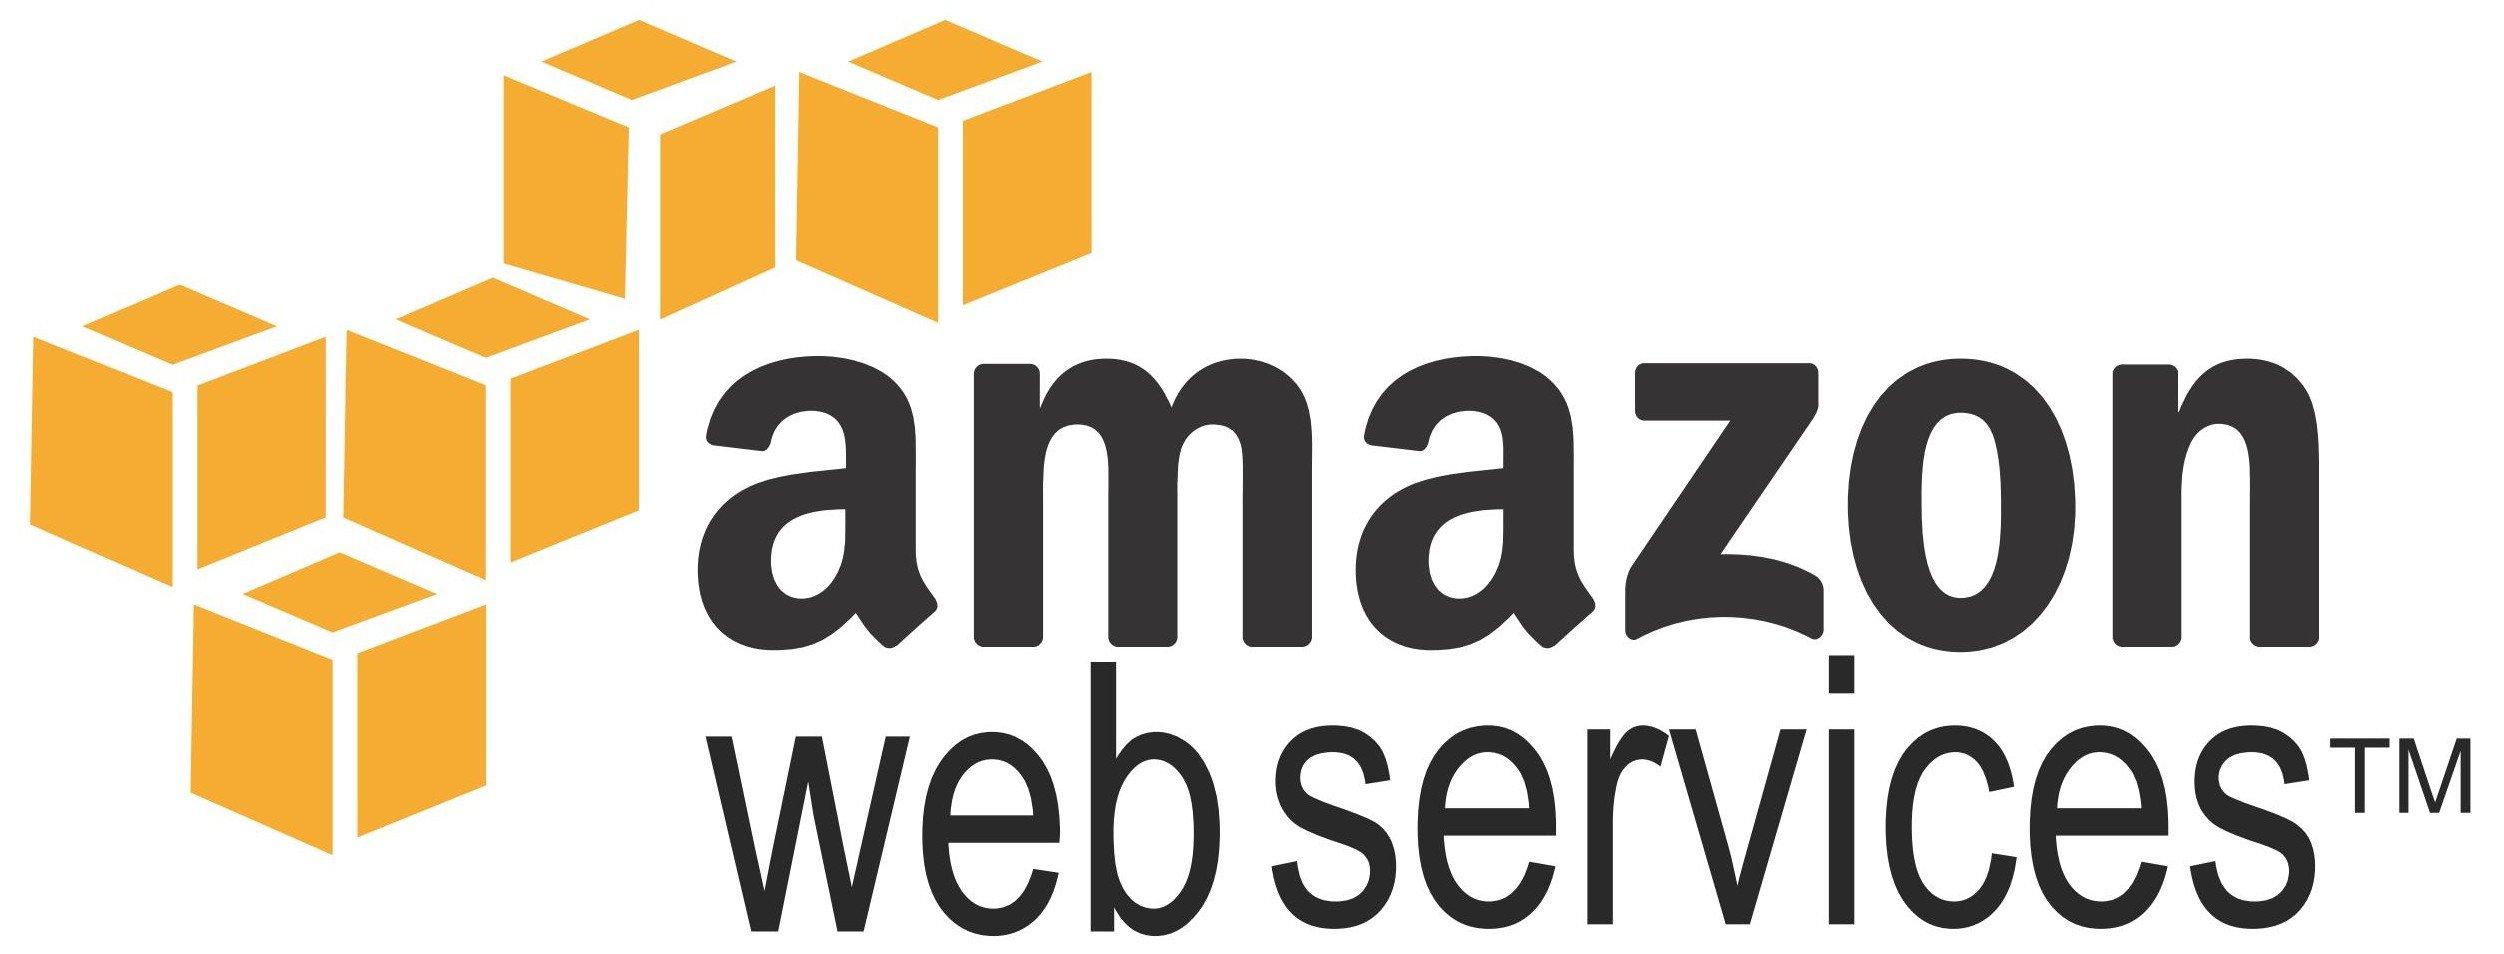 AWS – Amazon Web Services Logo [EPS File] Vector EPS Free Download, Logo, Icons, Brand Emblems